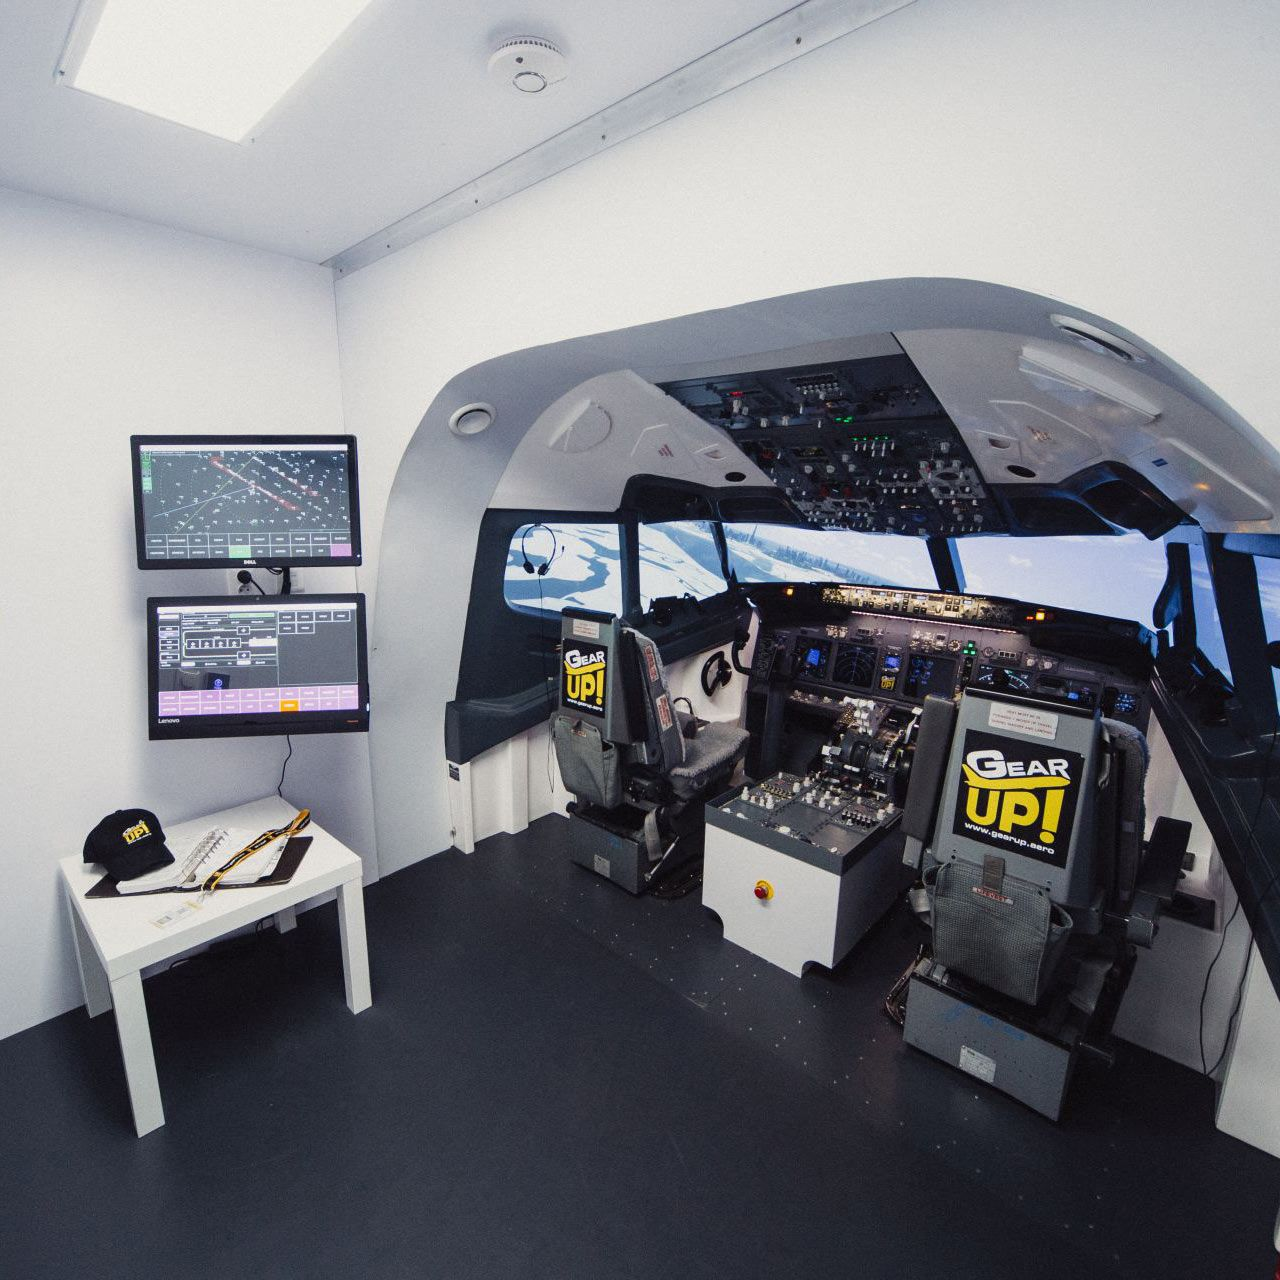 flight simulator, turnkey simulator, complete simulator, simulator